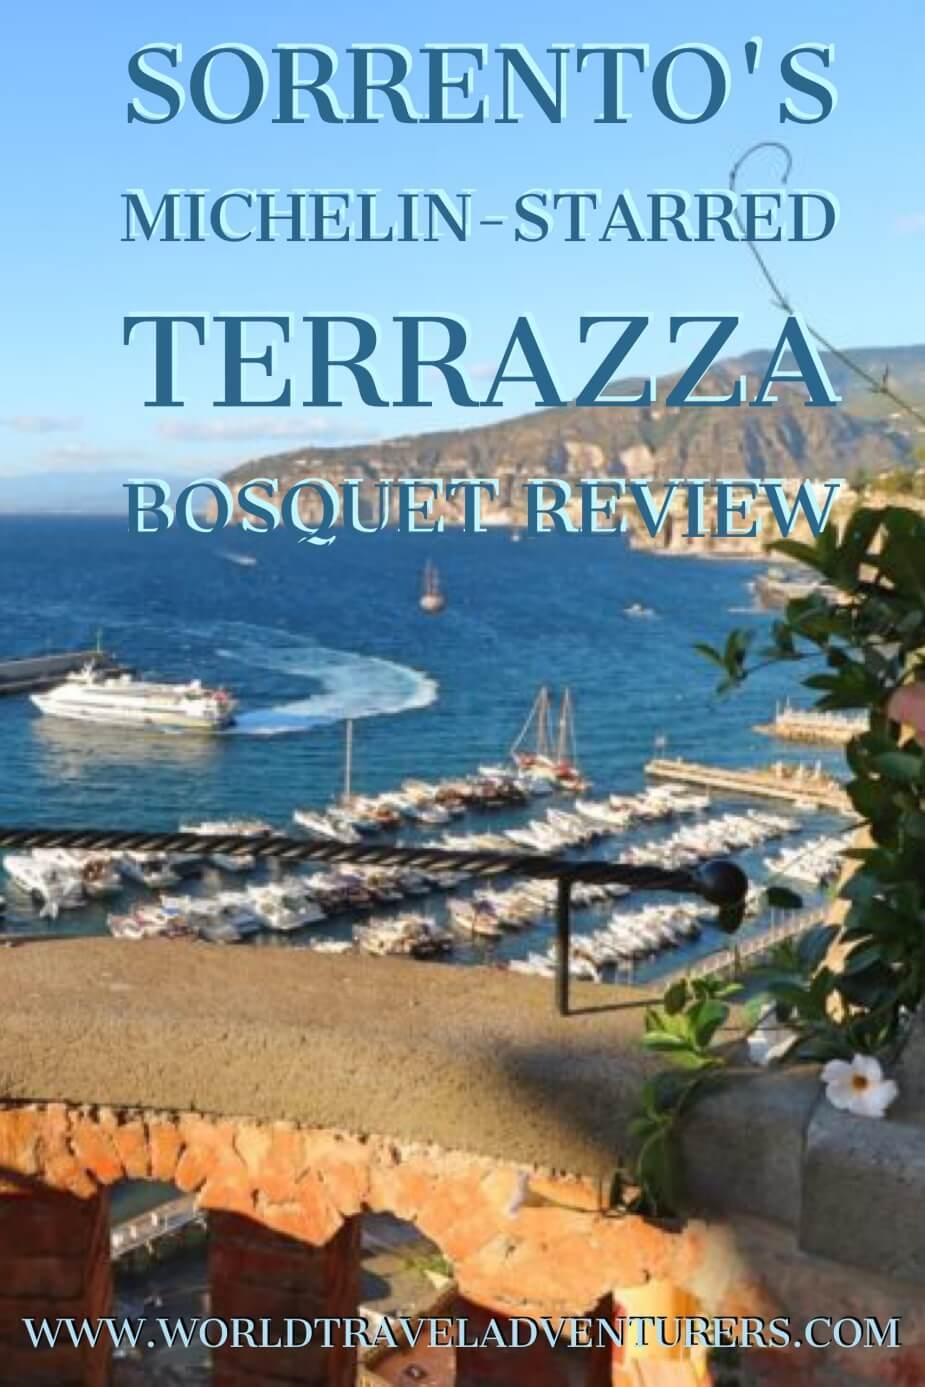 Sorrentos Michelin Star Terrazza Bosquet Review  Fine Italian dining